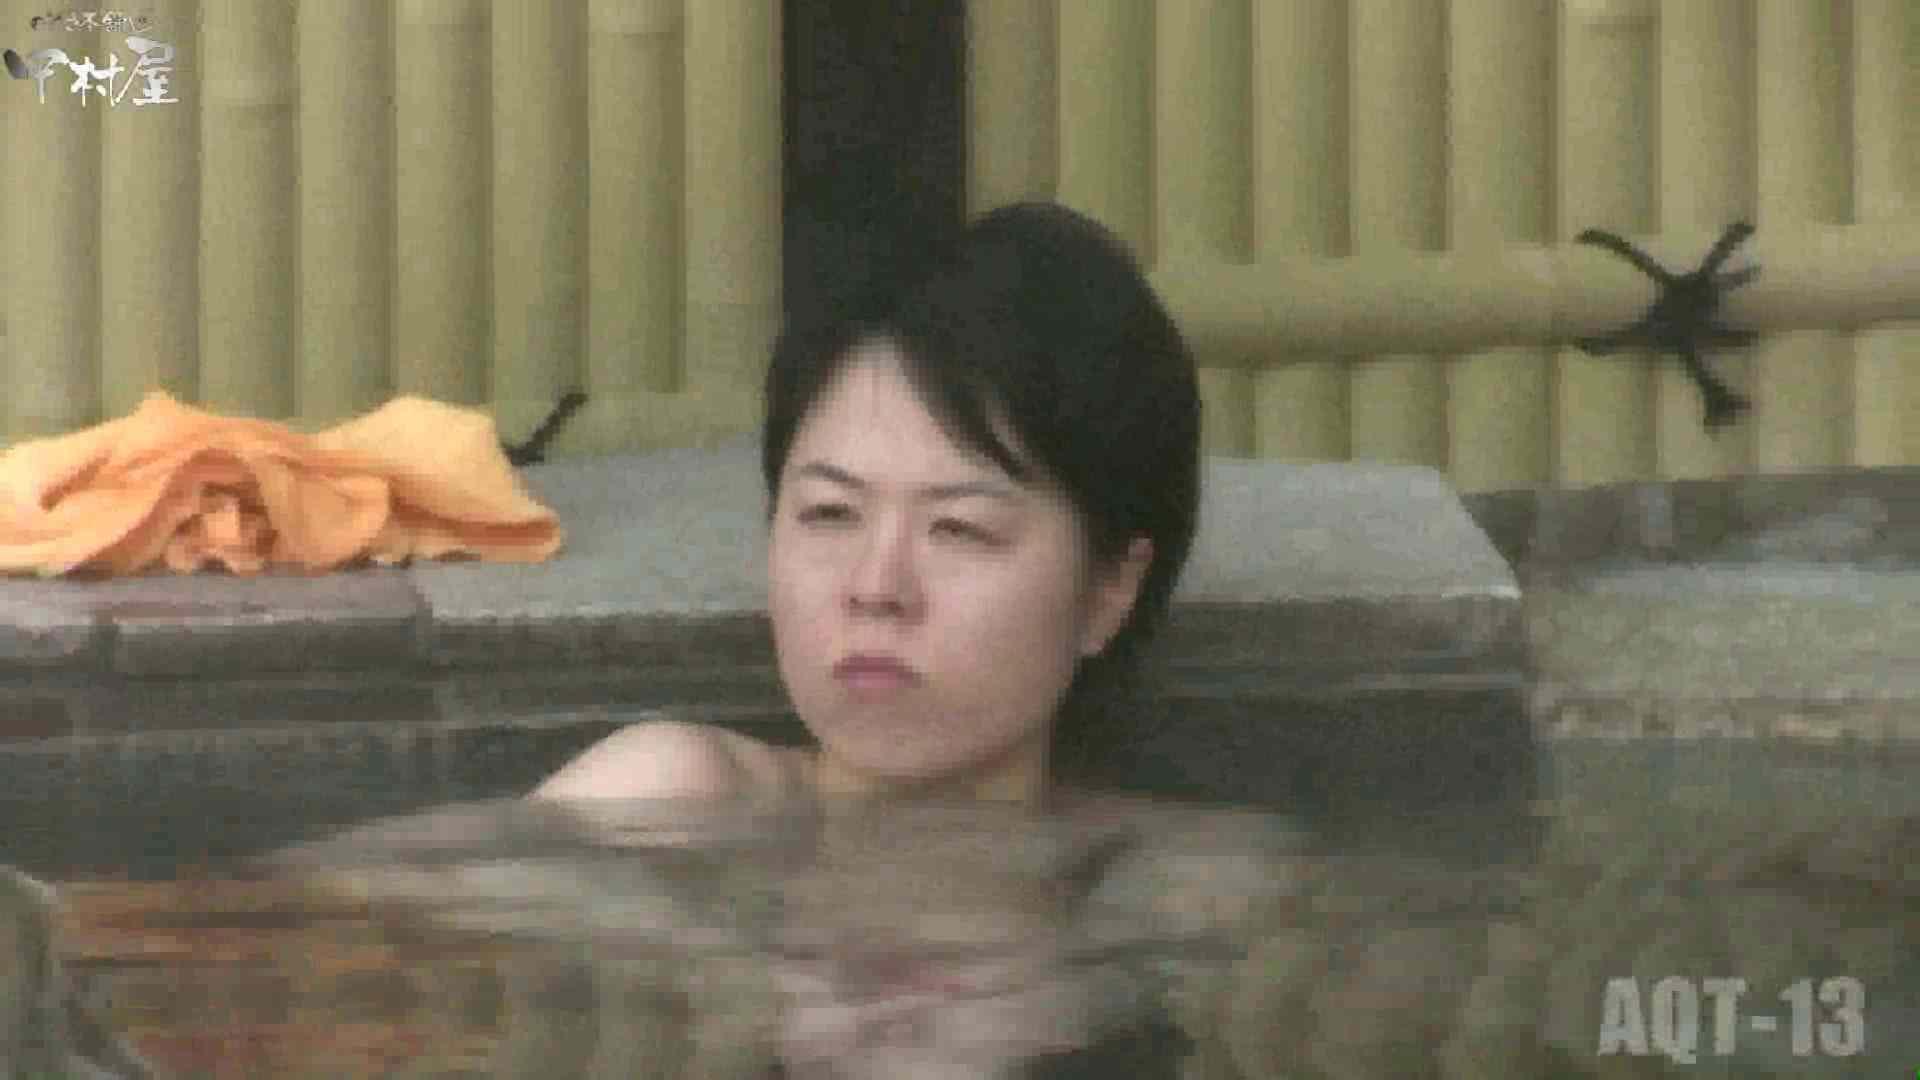 Aquaな露天風呂Vol.877潜入盗撮露天風呂十三判湯 其の四 潜入 | OLセックス  50画像 29